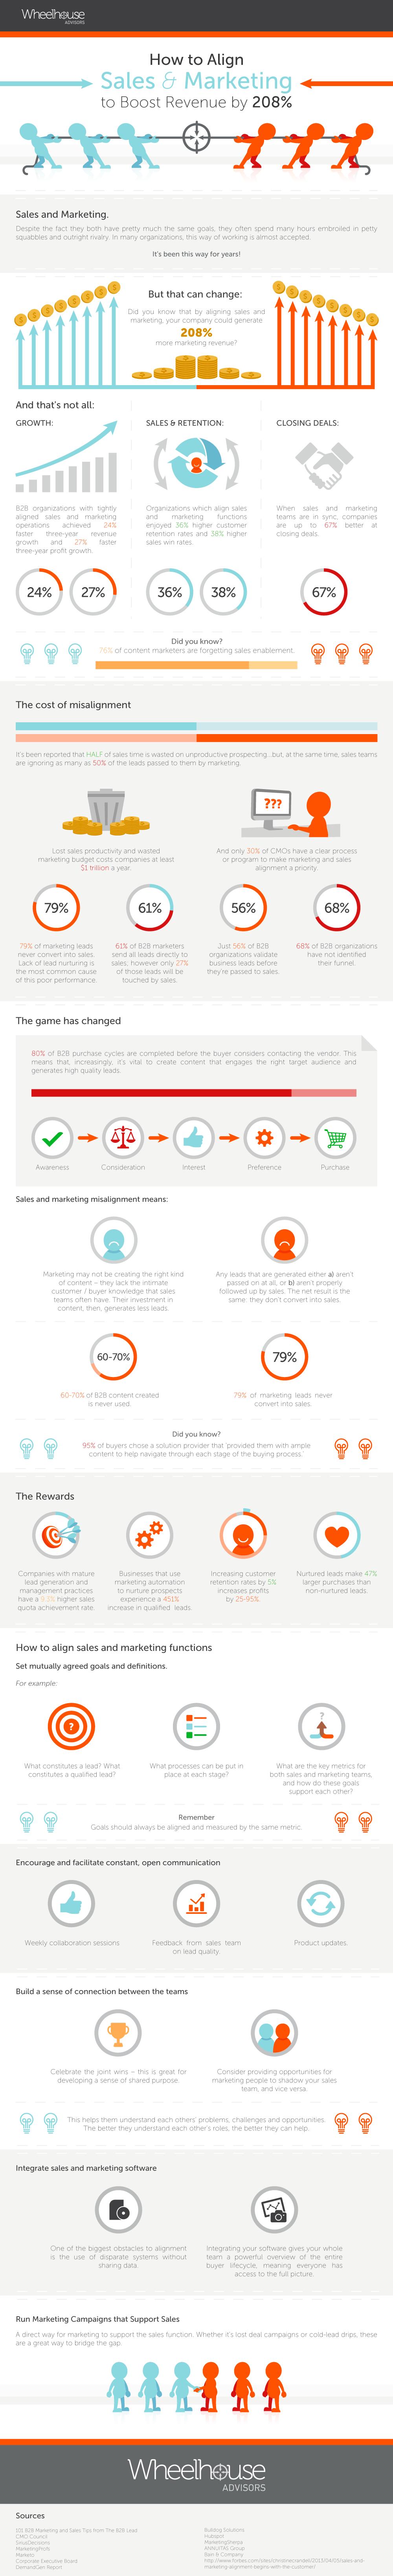 smarketing-infographic-wheelhouse